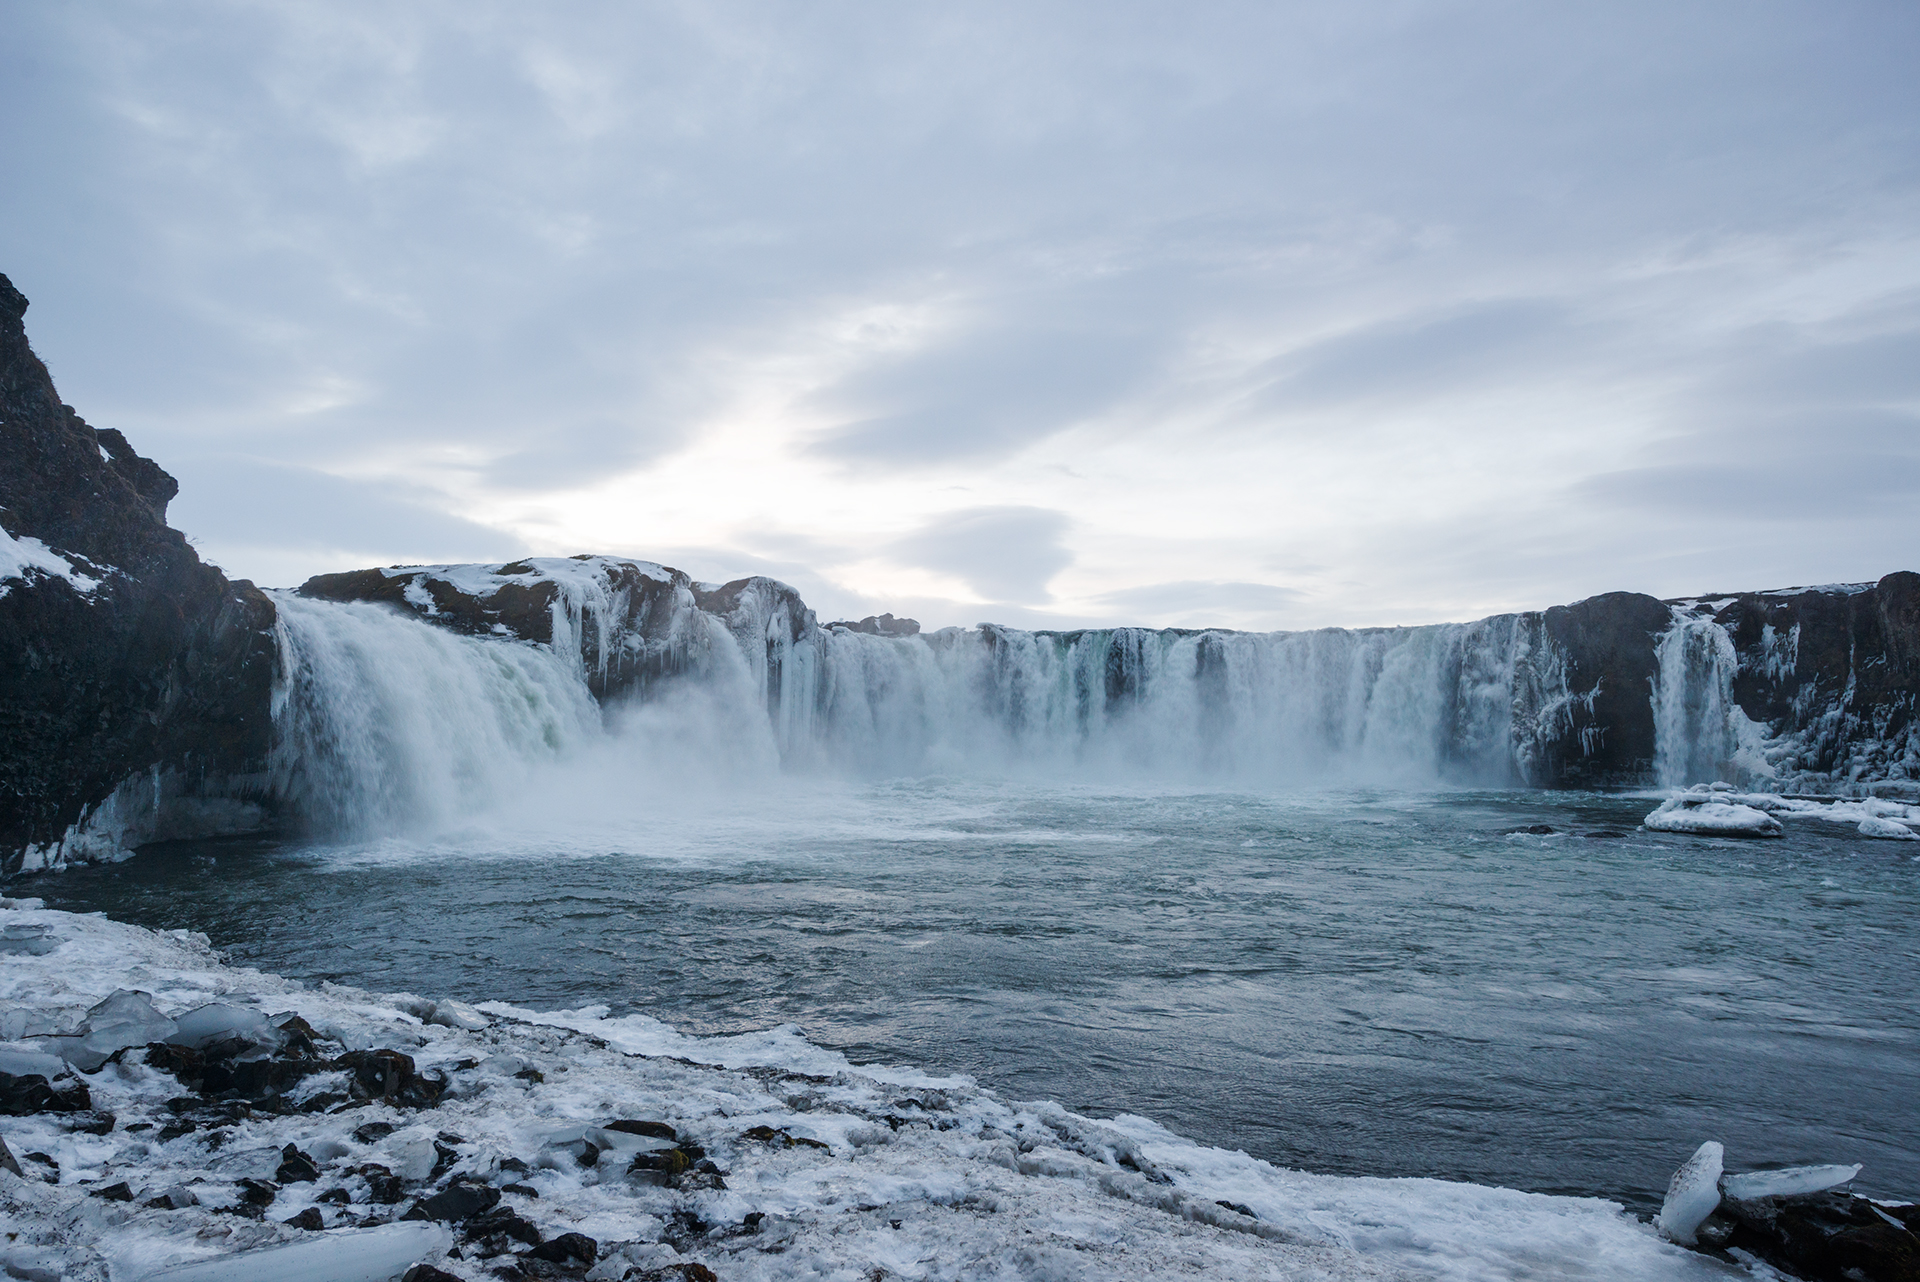 Godafoss icelandic wonder attraction winter days